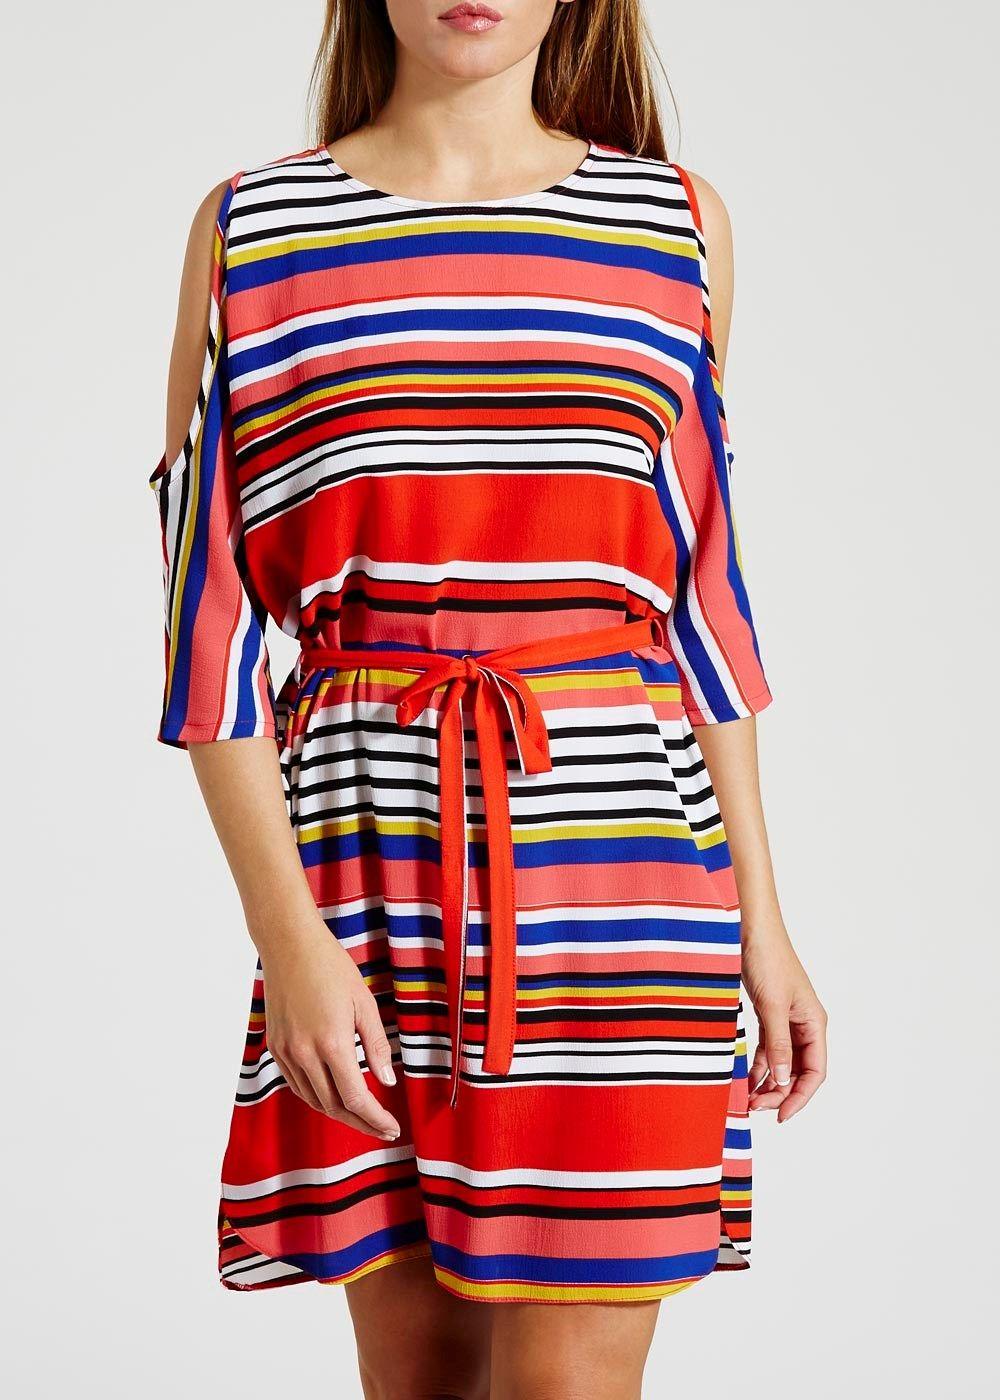 Matalan Dresses